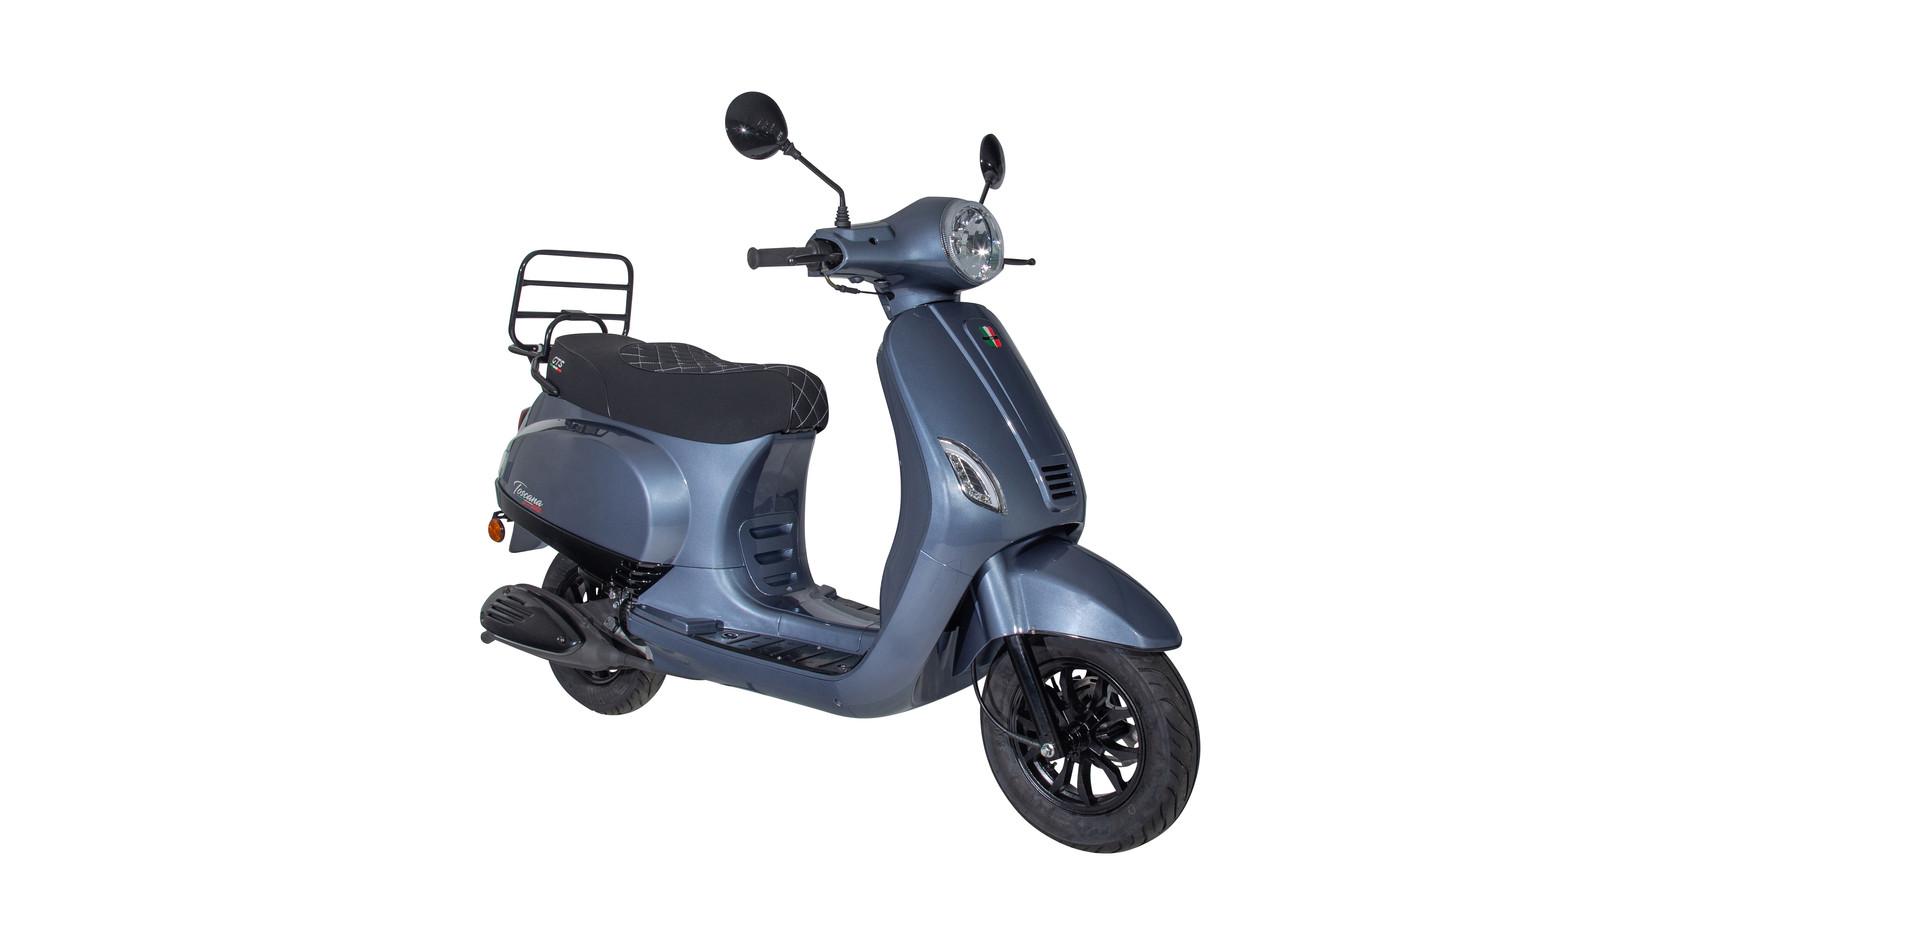 Toscana dynamic byron bleu.jpg